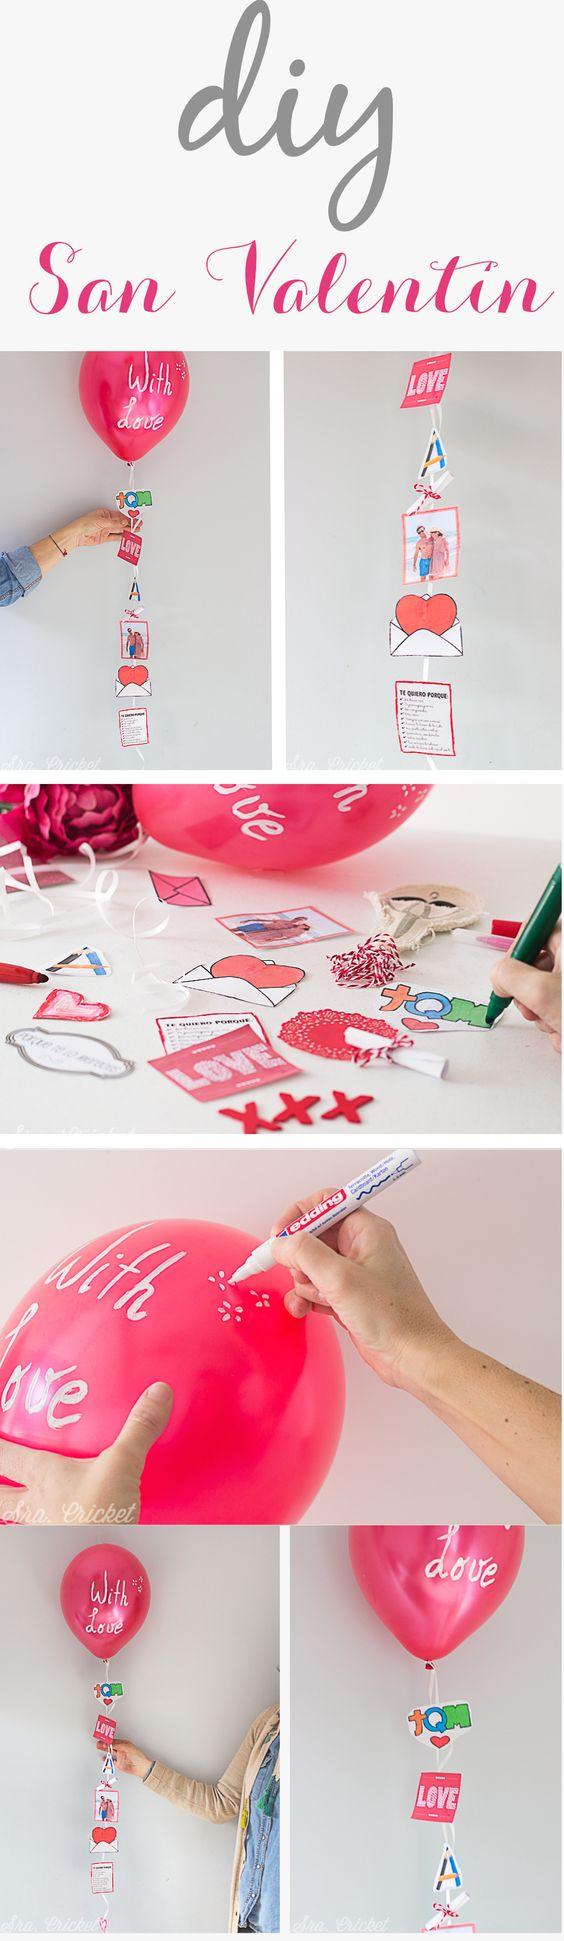 San Valentín barato: globos